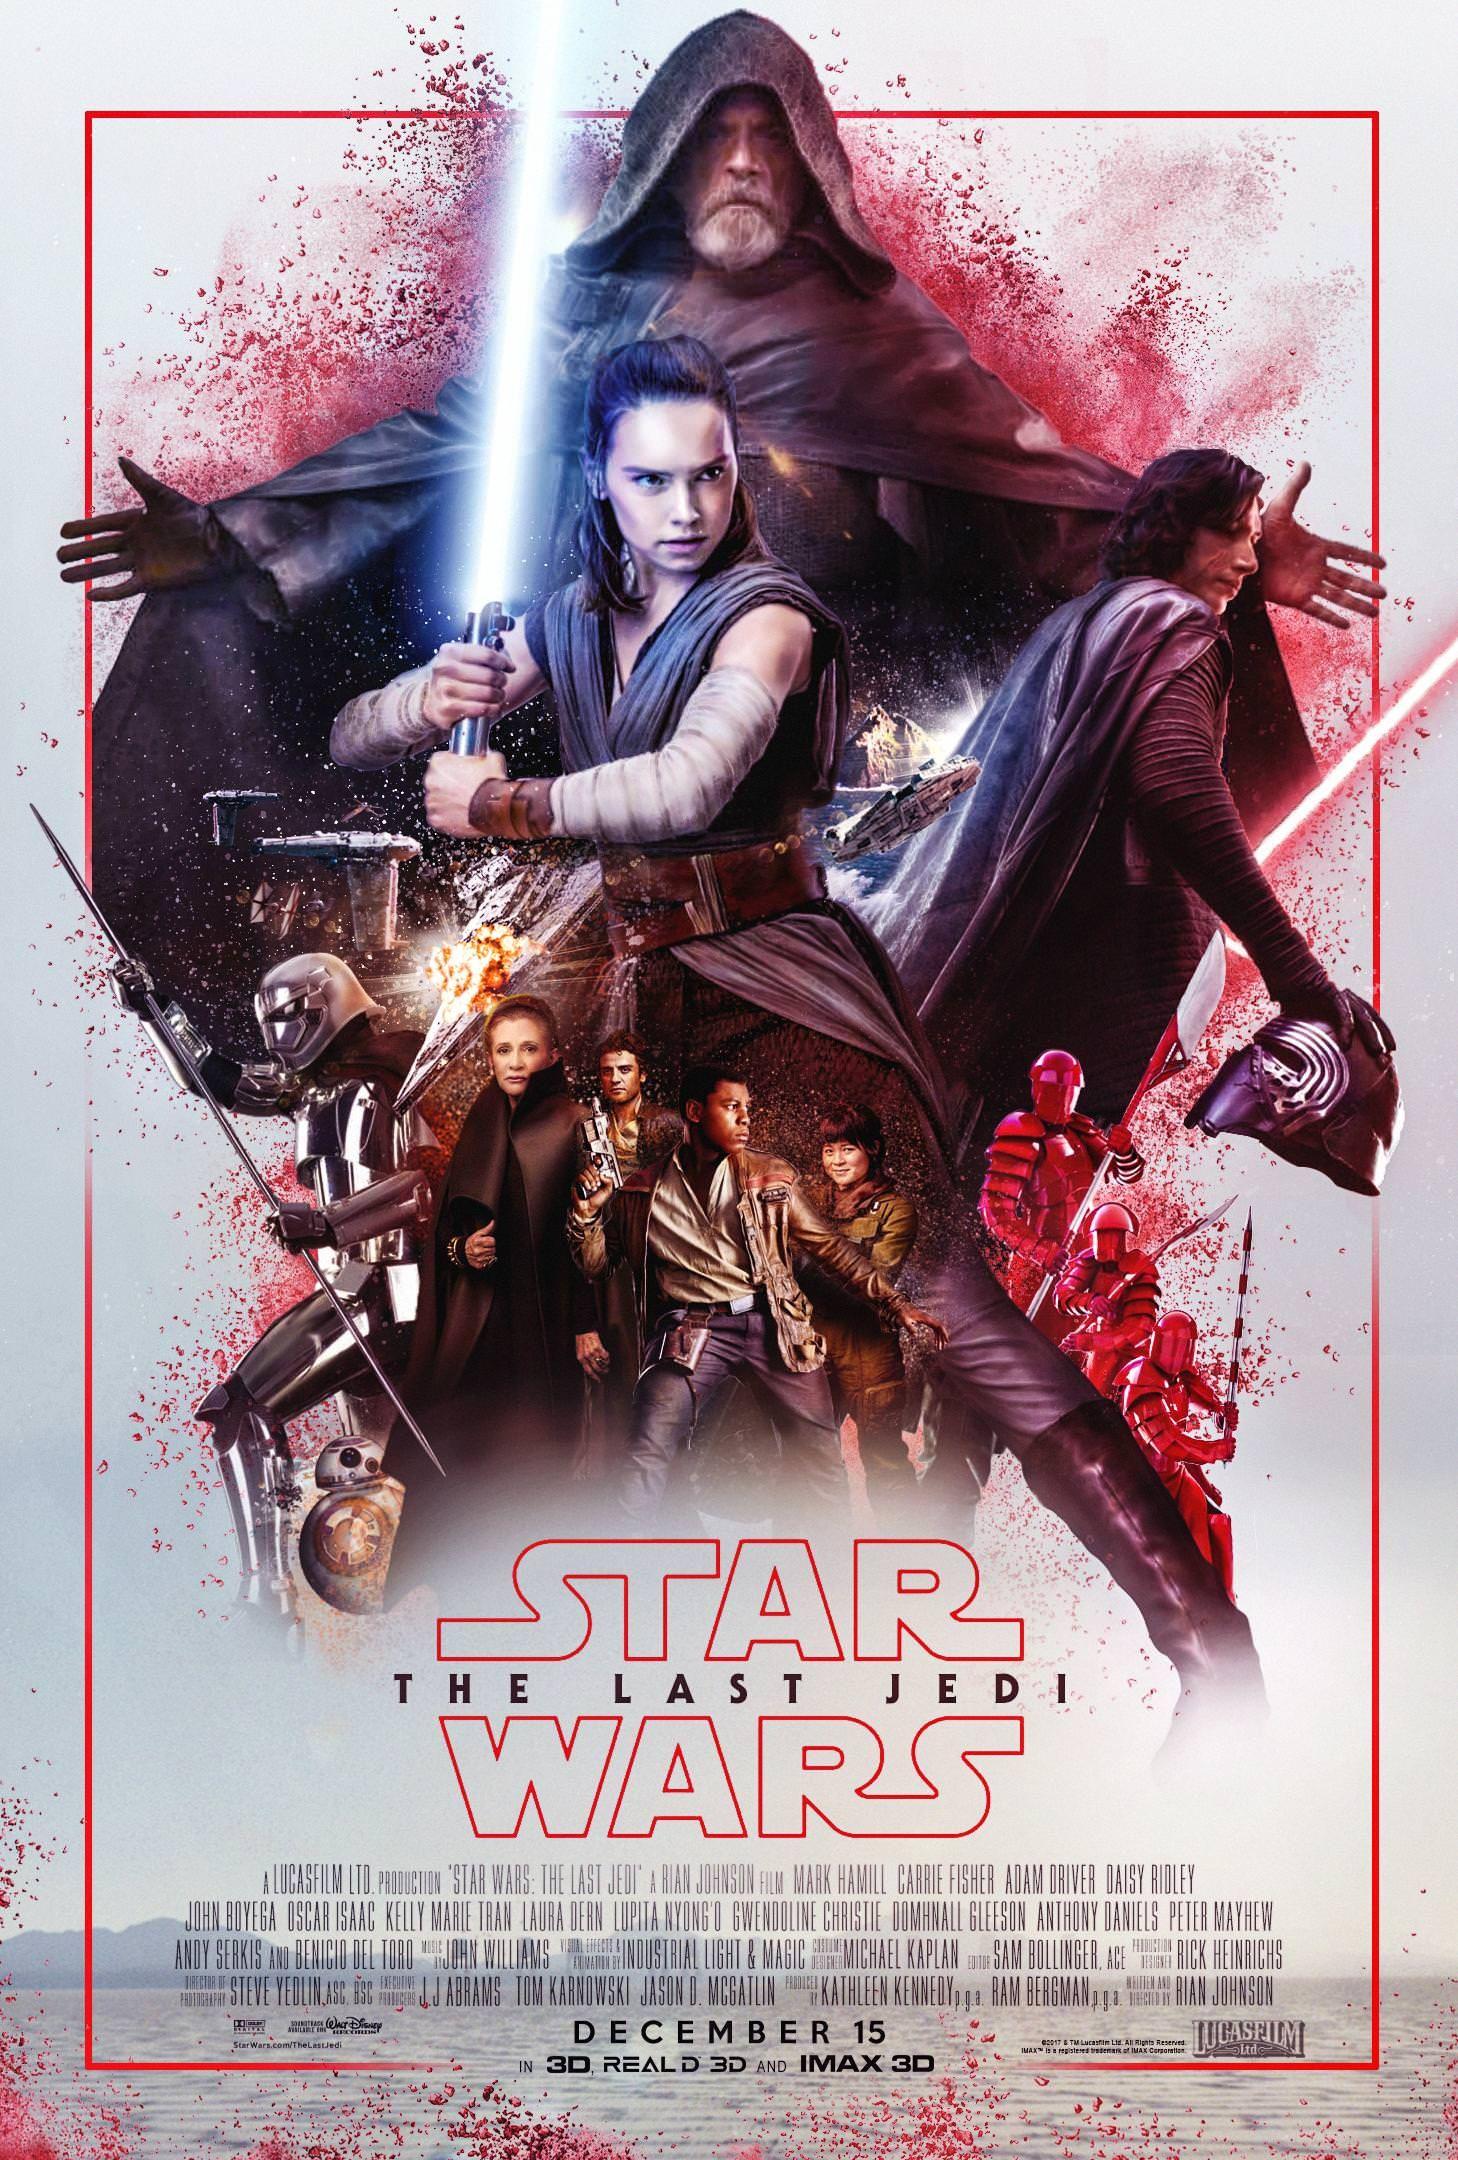 Star Wars Episode Viii The Last Jedi 2017 Hd Wallpaper From